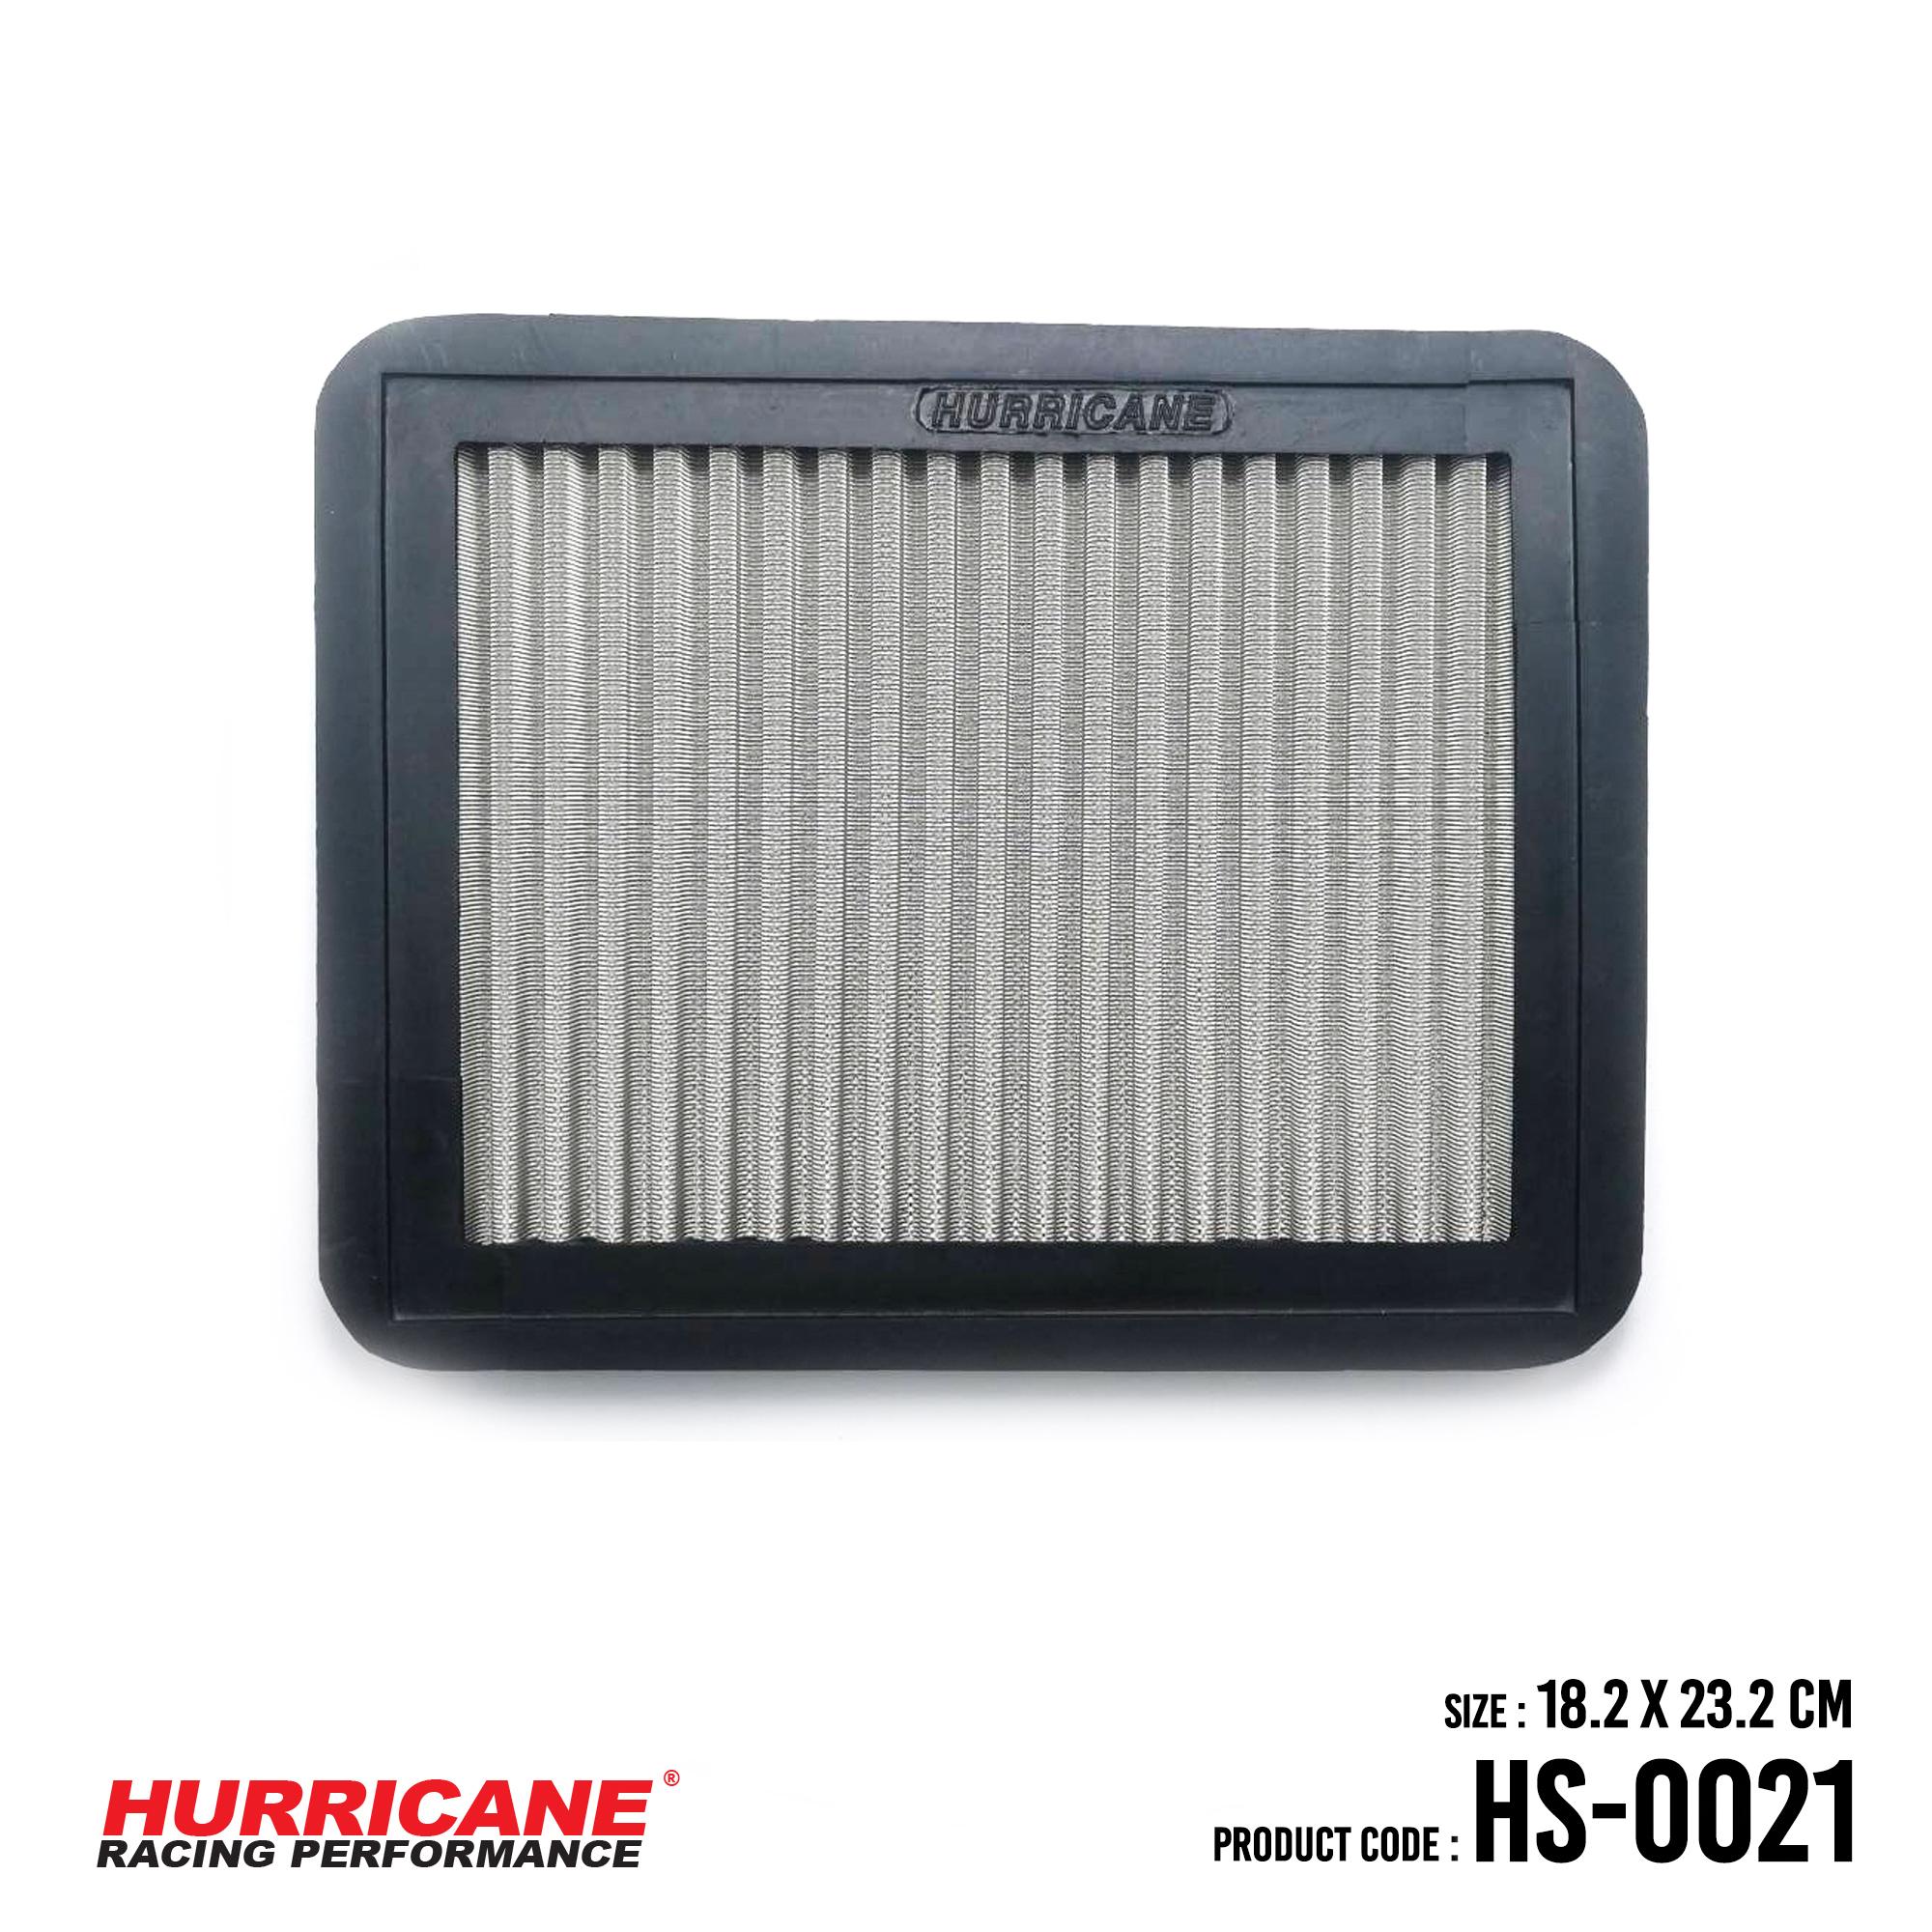 HURRICANE STAINLESS STEEL AIR FILTER FOR HS-0021 ChryslerDodgeMazdaMitsubishiPlymouth